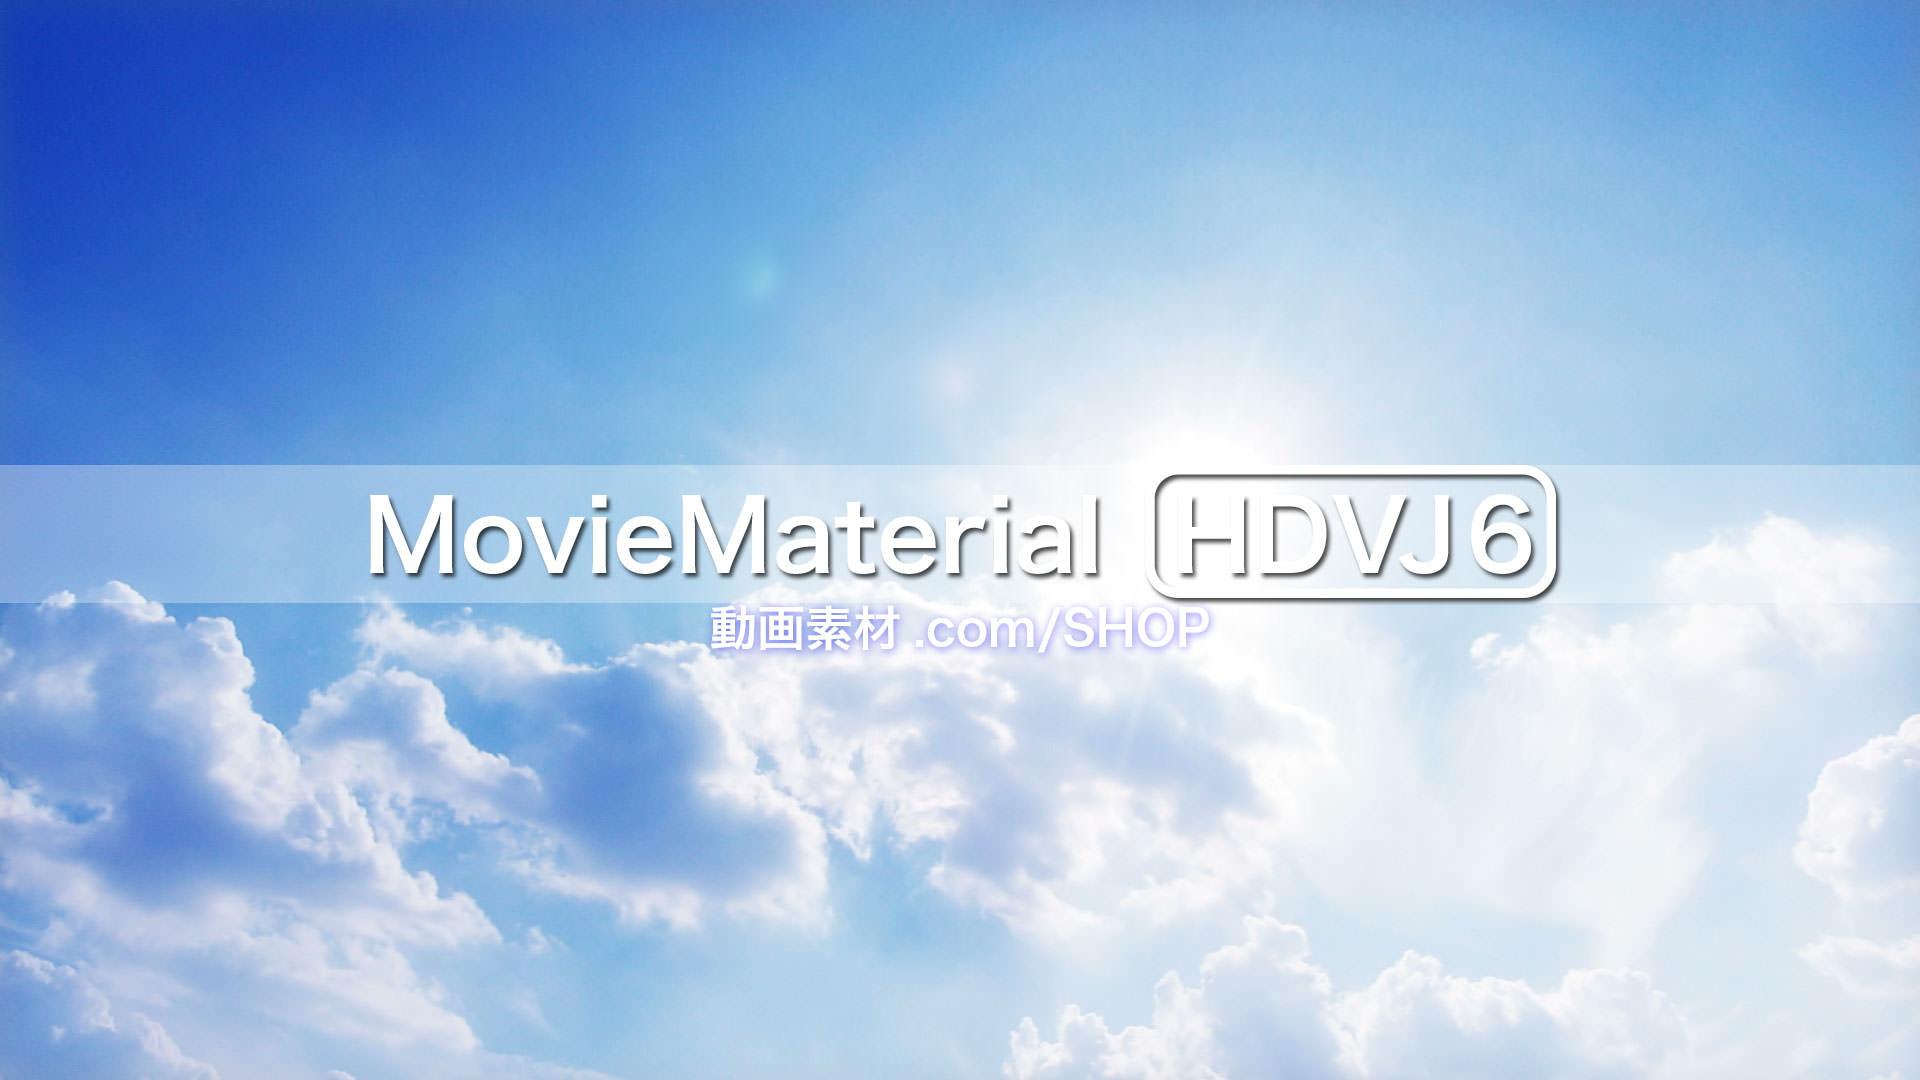 MovieMaterial HDVJ6 フルハイビジョンVJ動画素材集 画像6